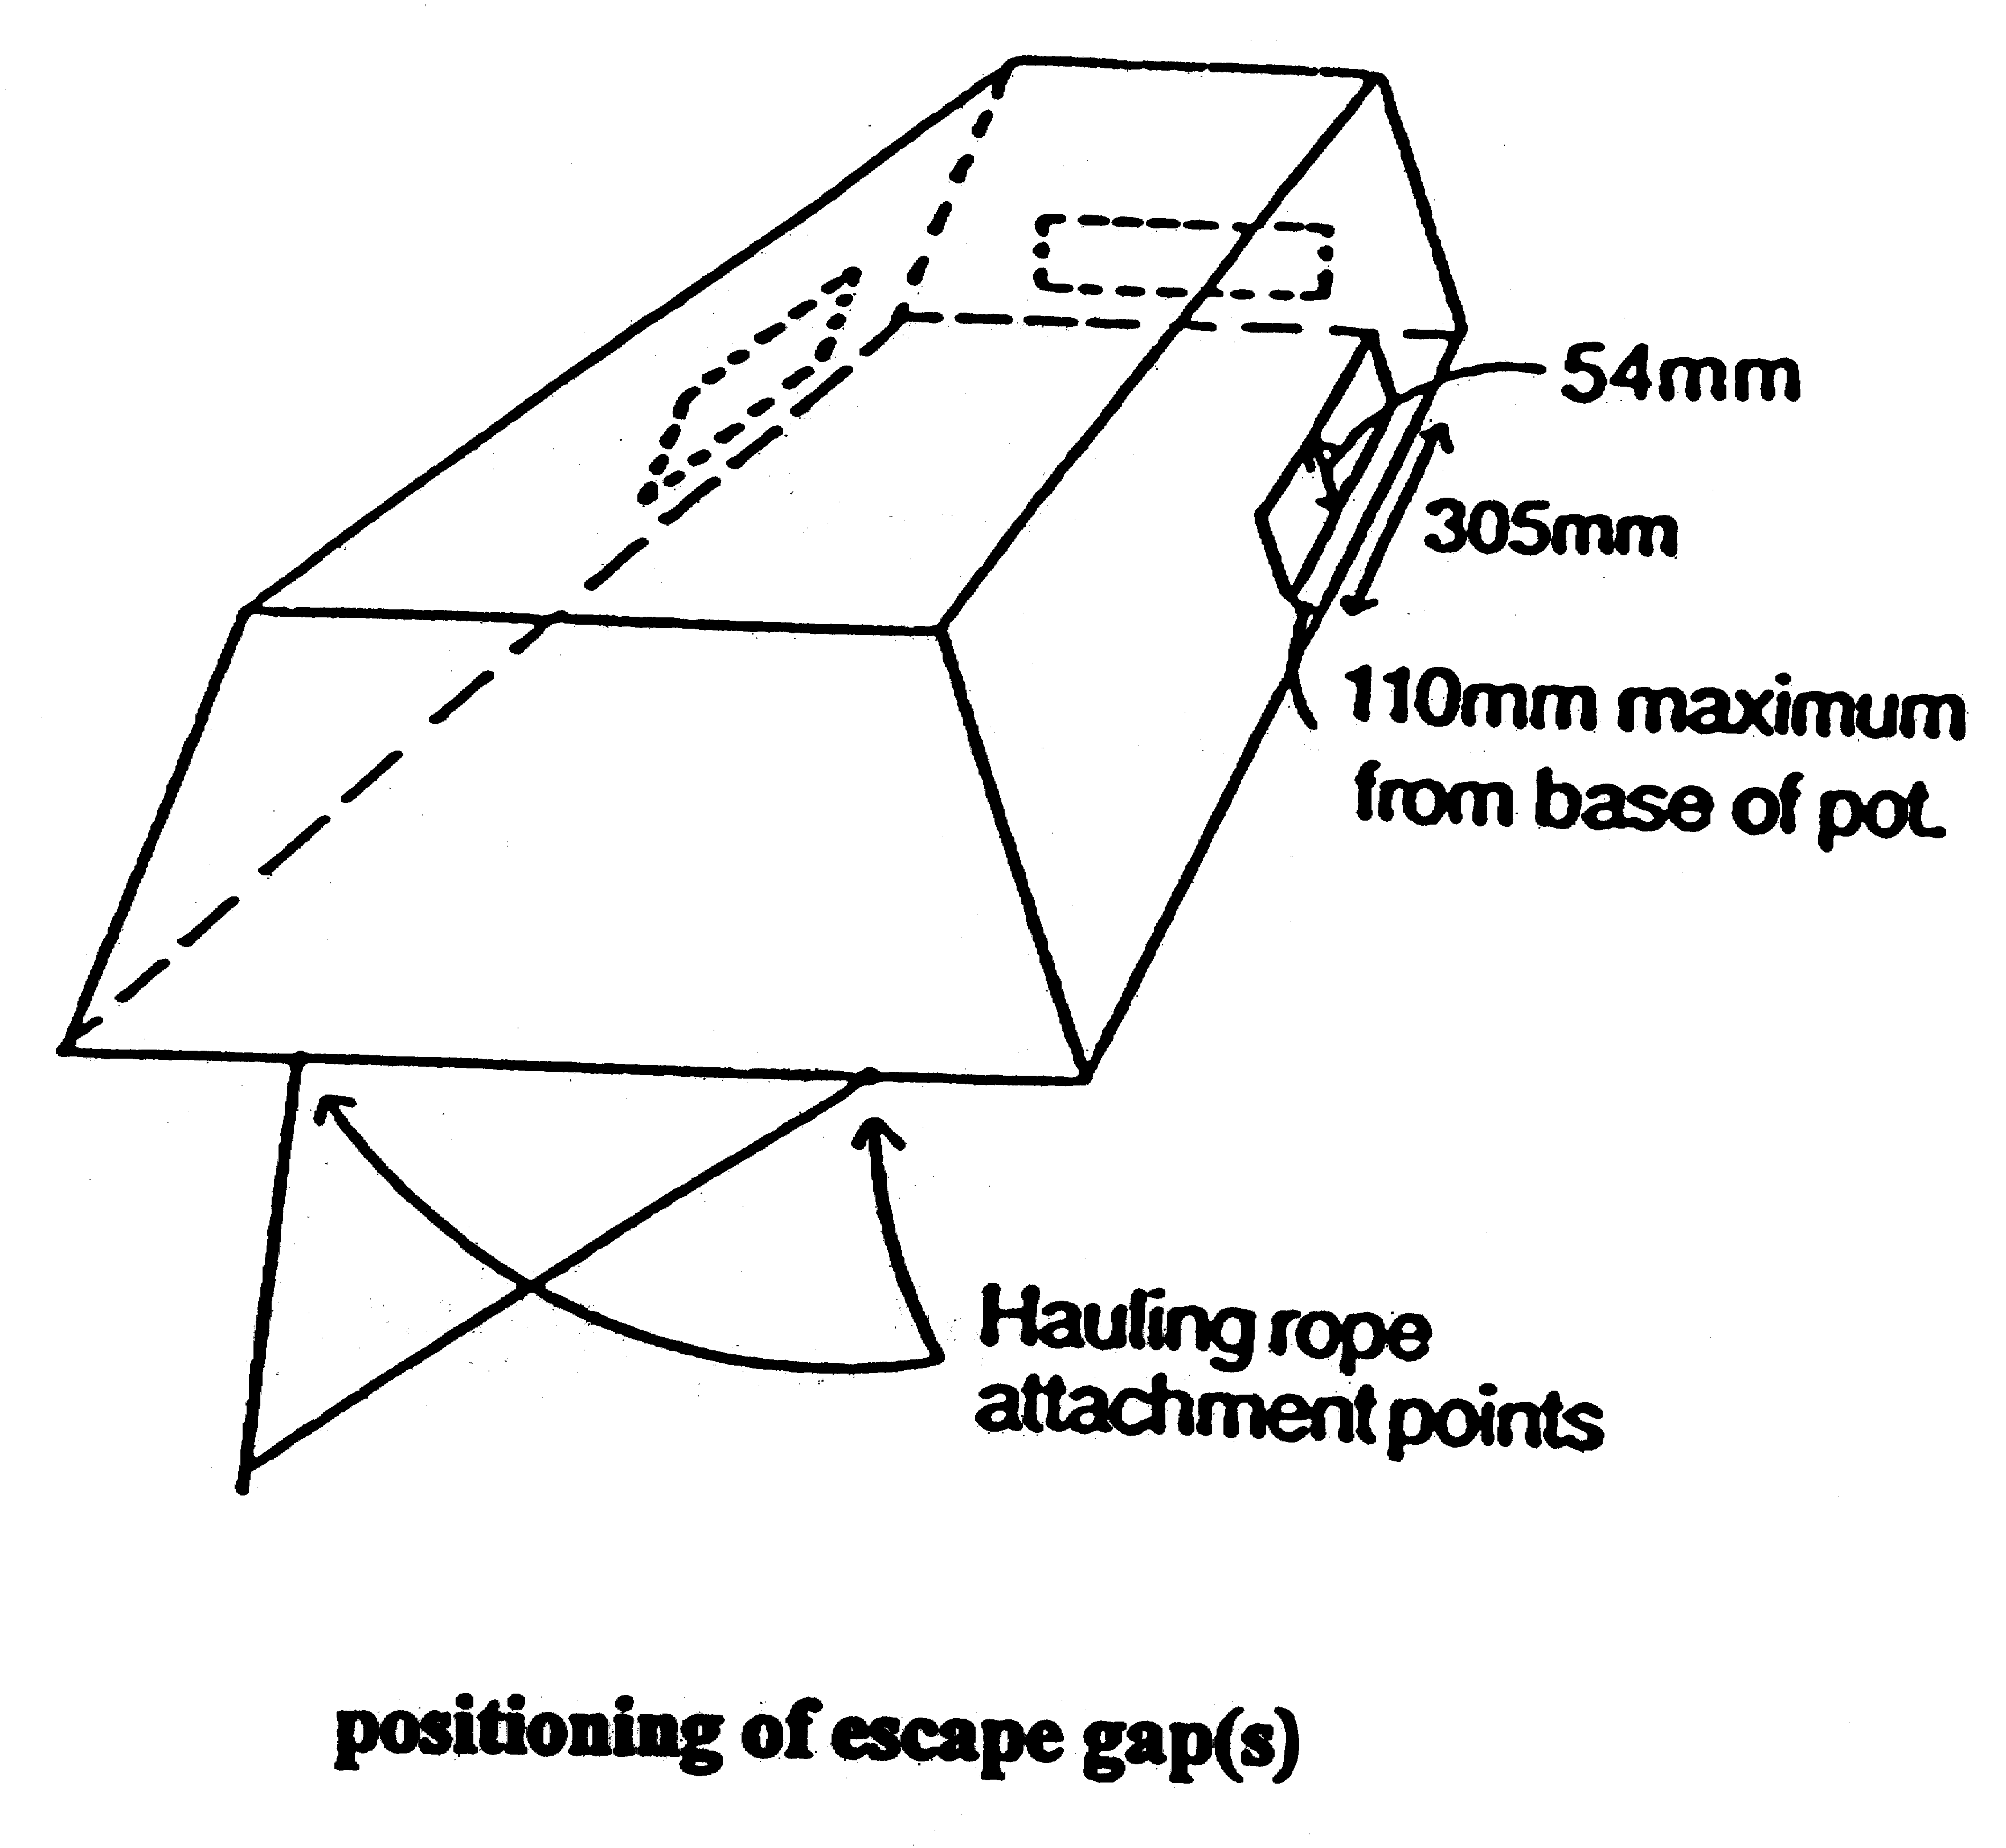 Fish Resources Management Regulations 1995 11 M0 04 Xml Pot Still Diagram